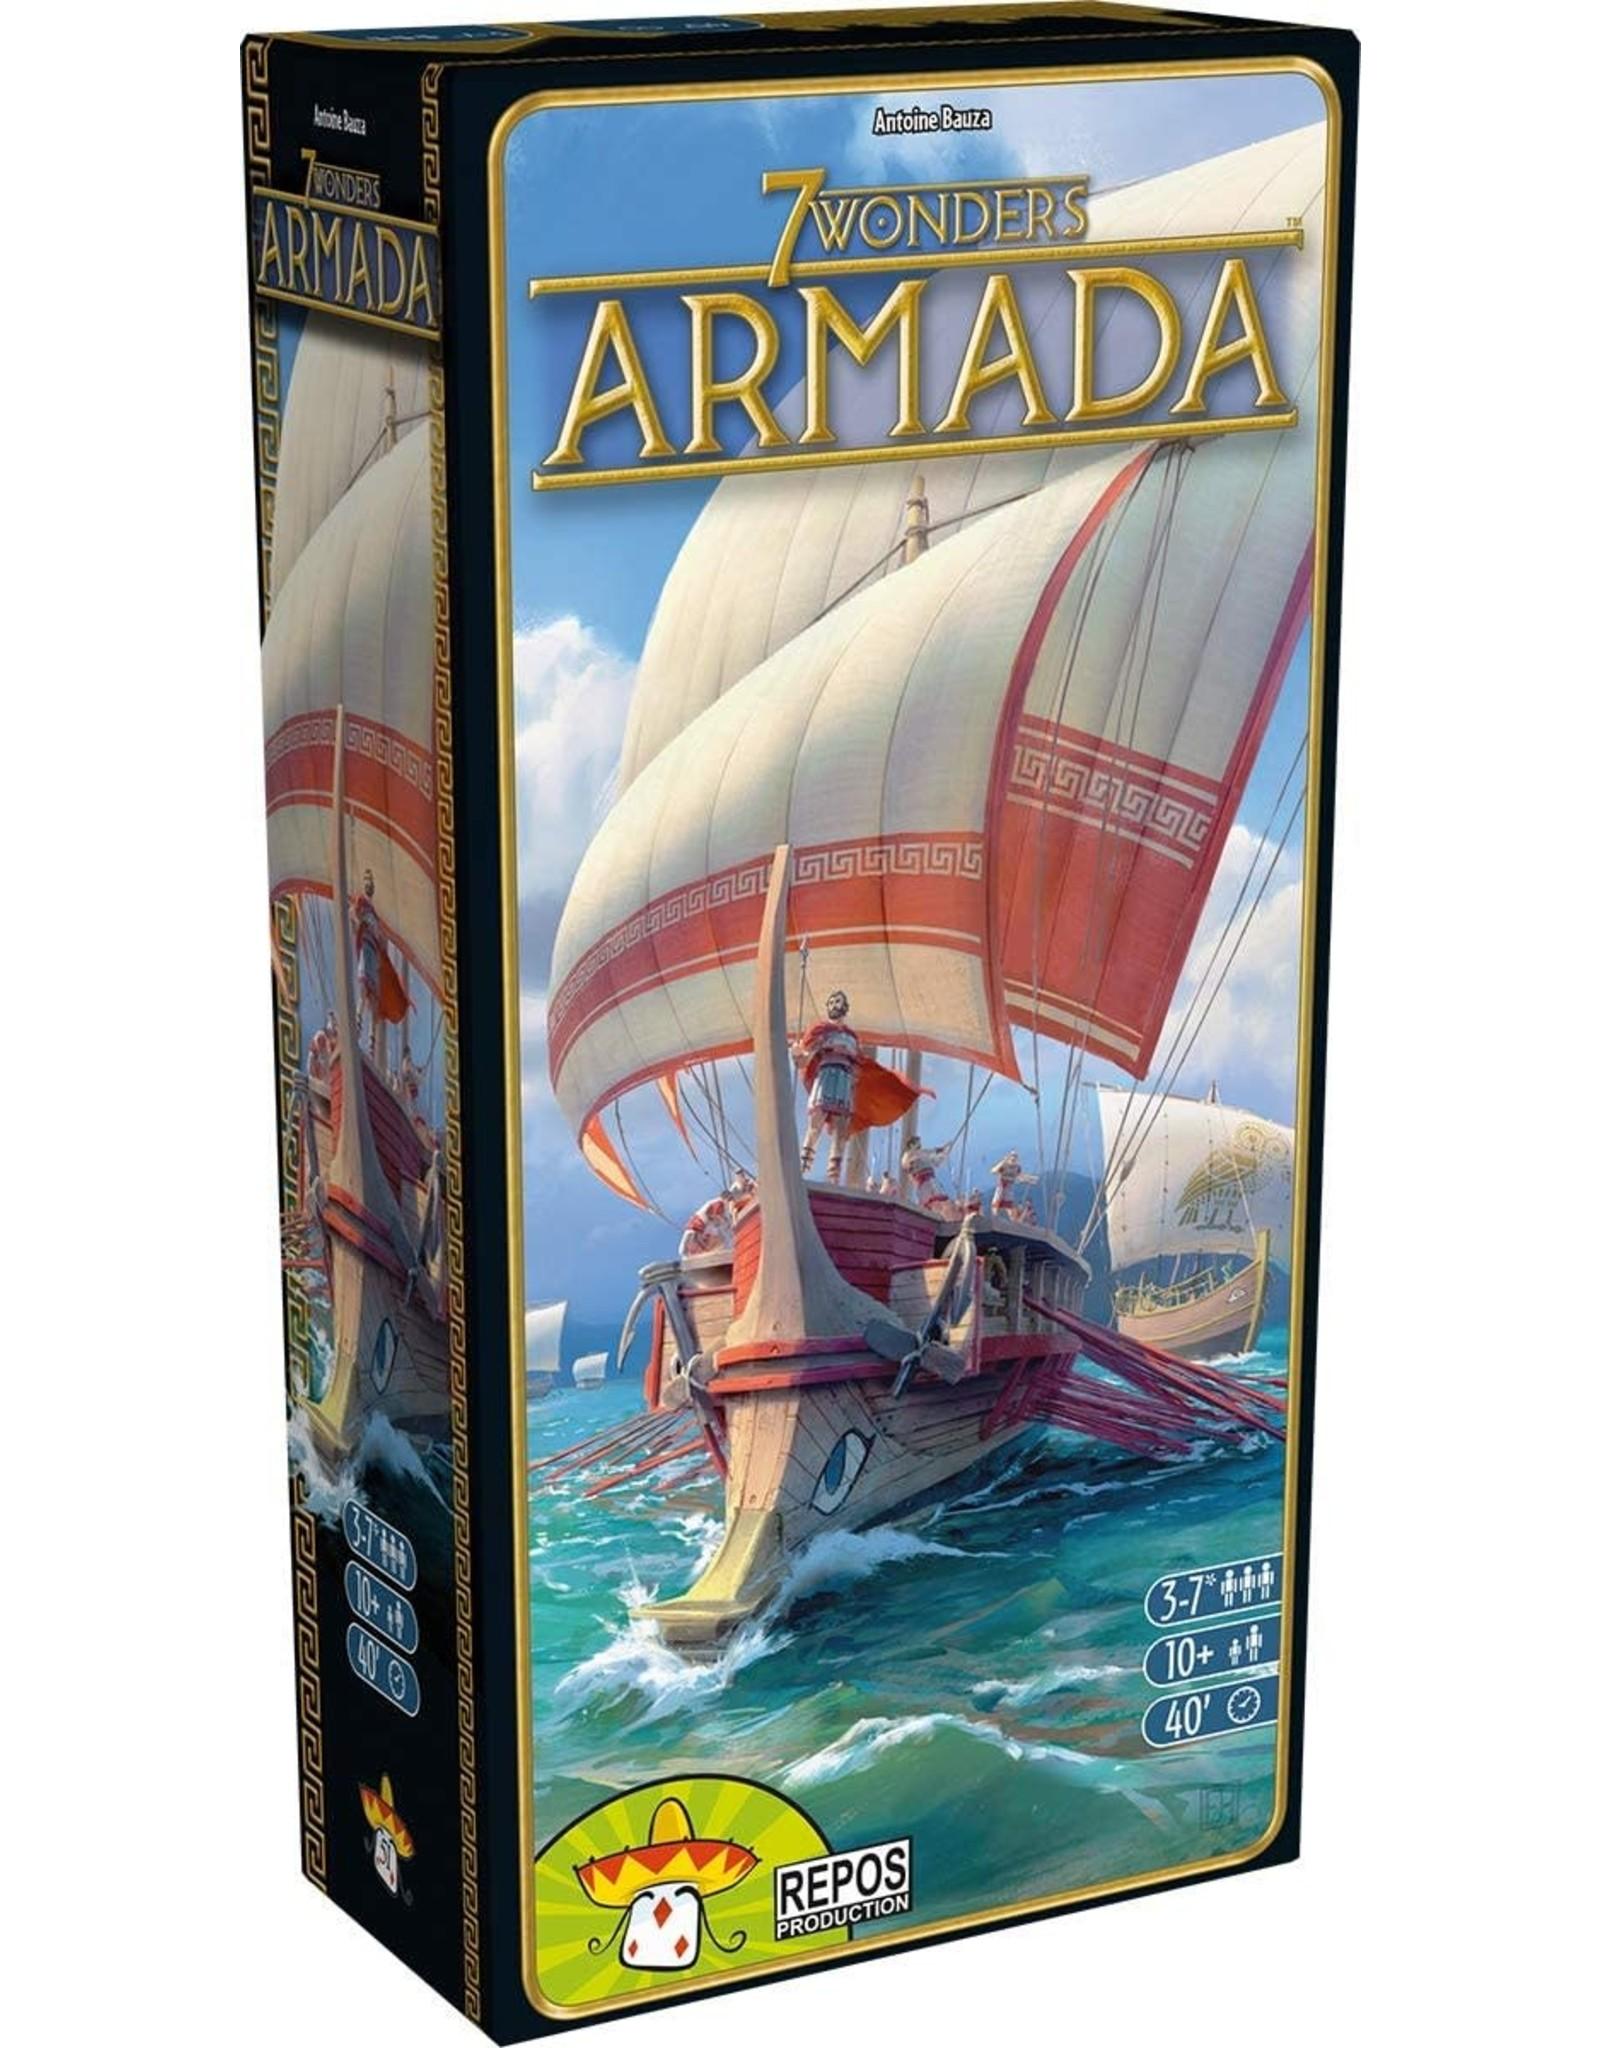 REPOS PRODUCTION 7 WONDERS ARMADA 2ND EDITION